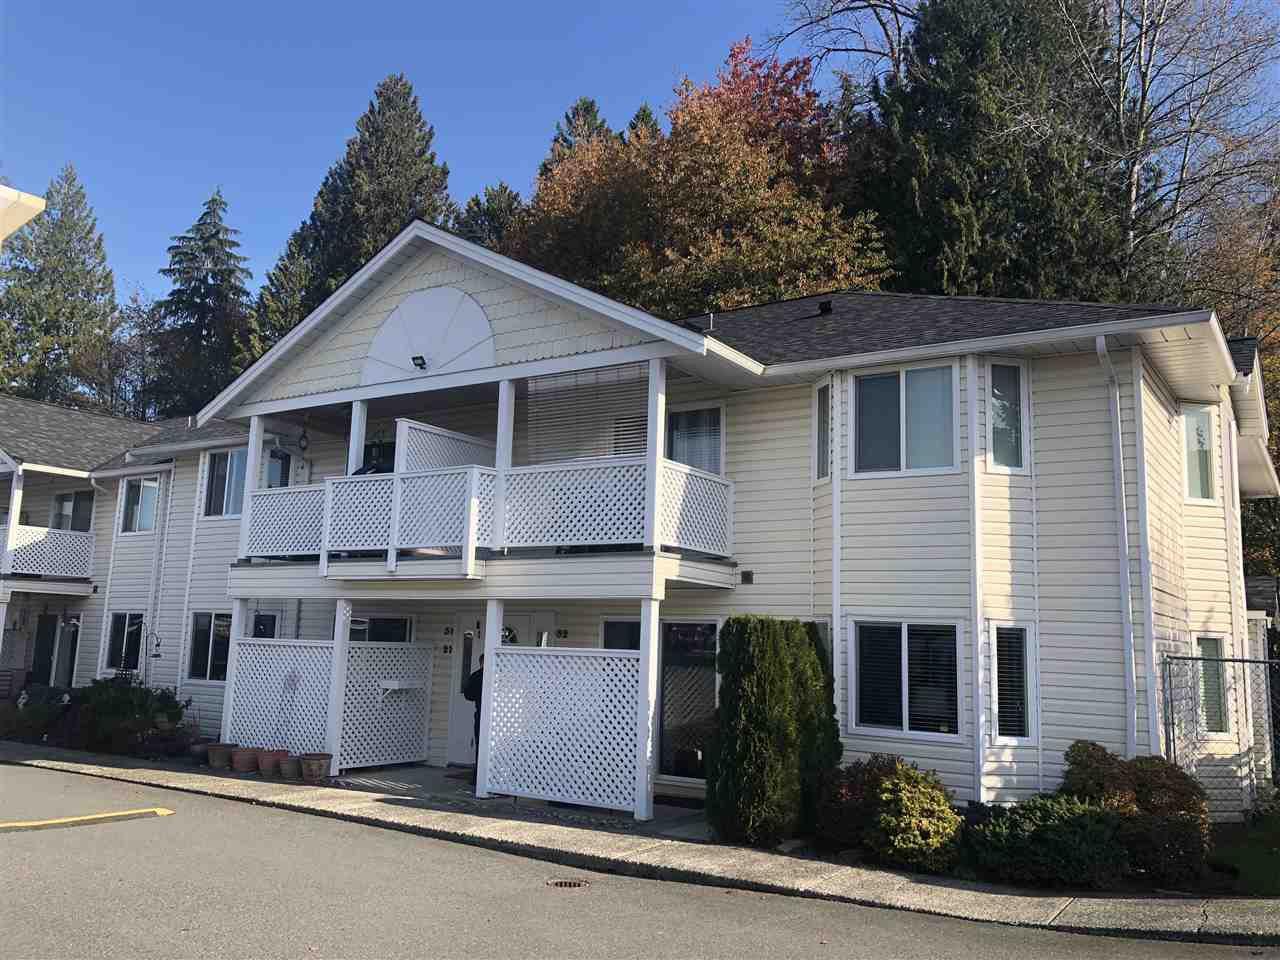 "Main Photo: 31 20799 119 Avenue in Maple Ridge: Southwest Maple Ridge Townhouse for sale in ""MEADOW RIDGE ESTATE"" : MLS®# R2416833"